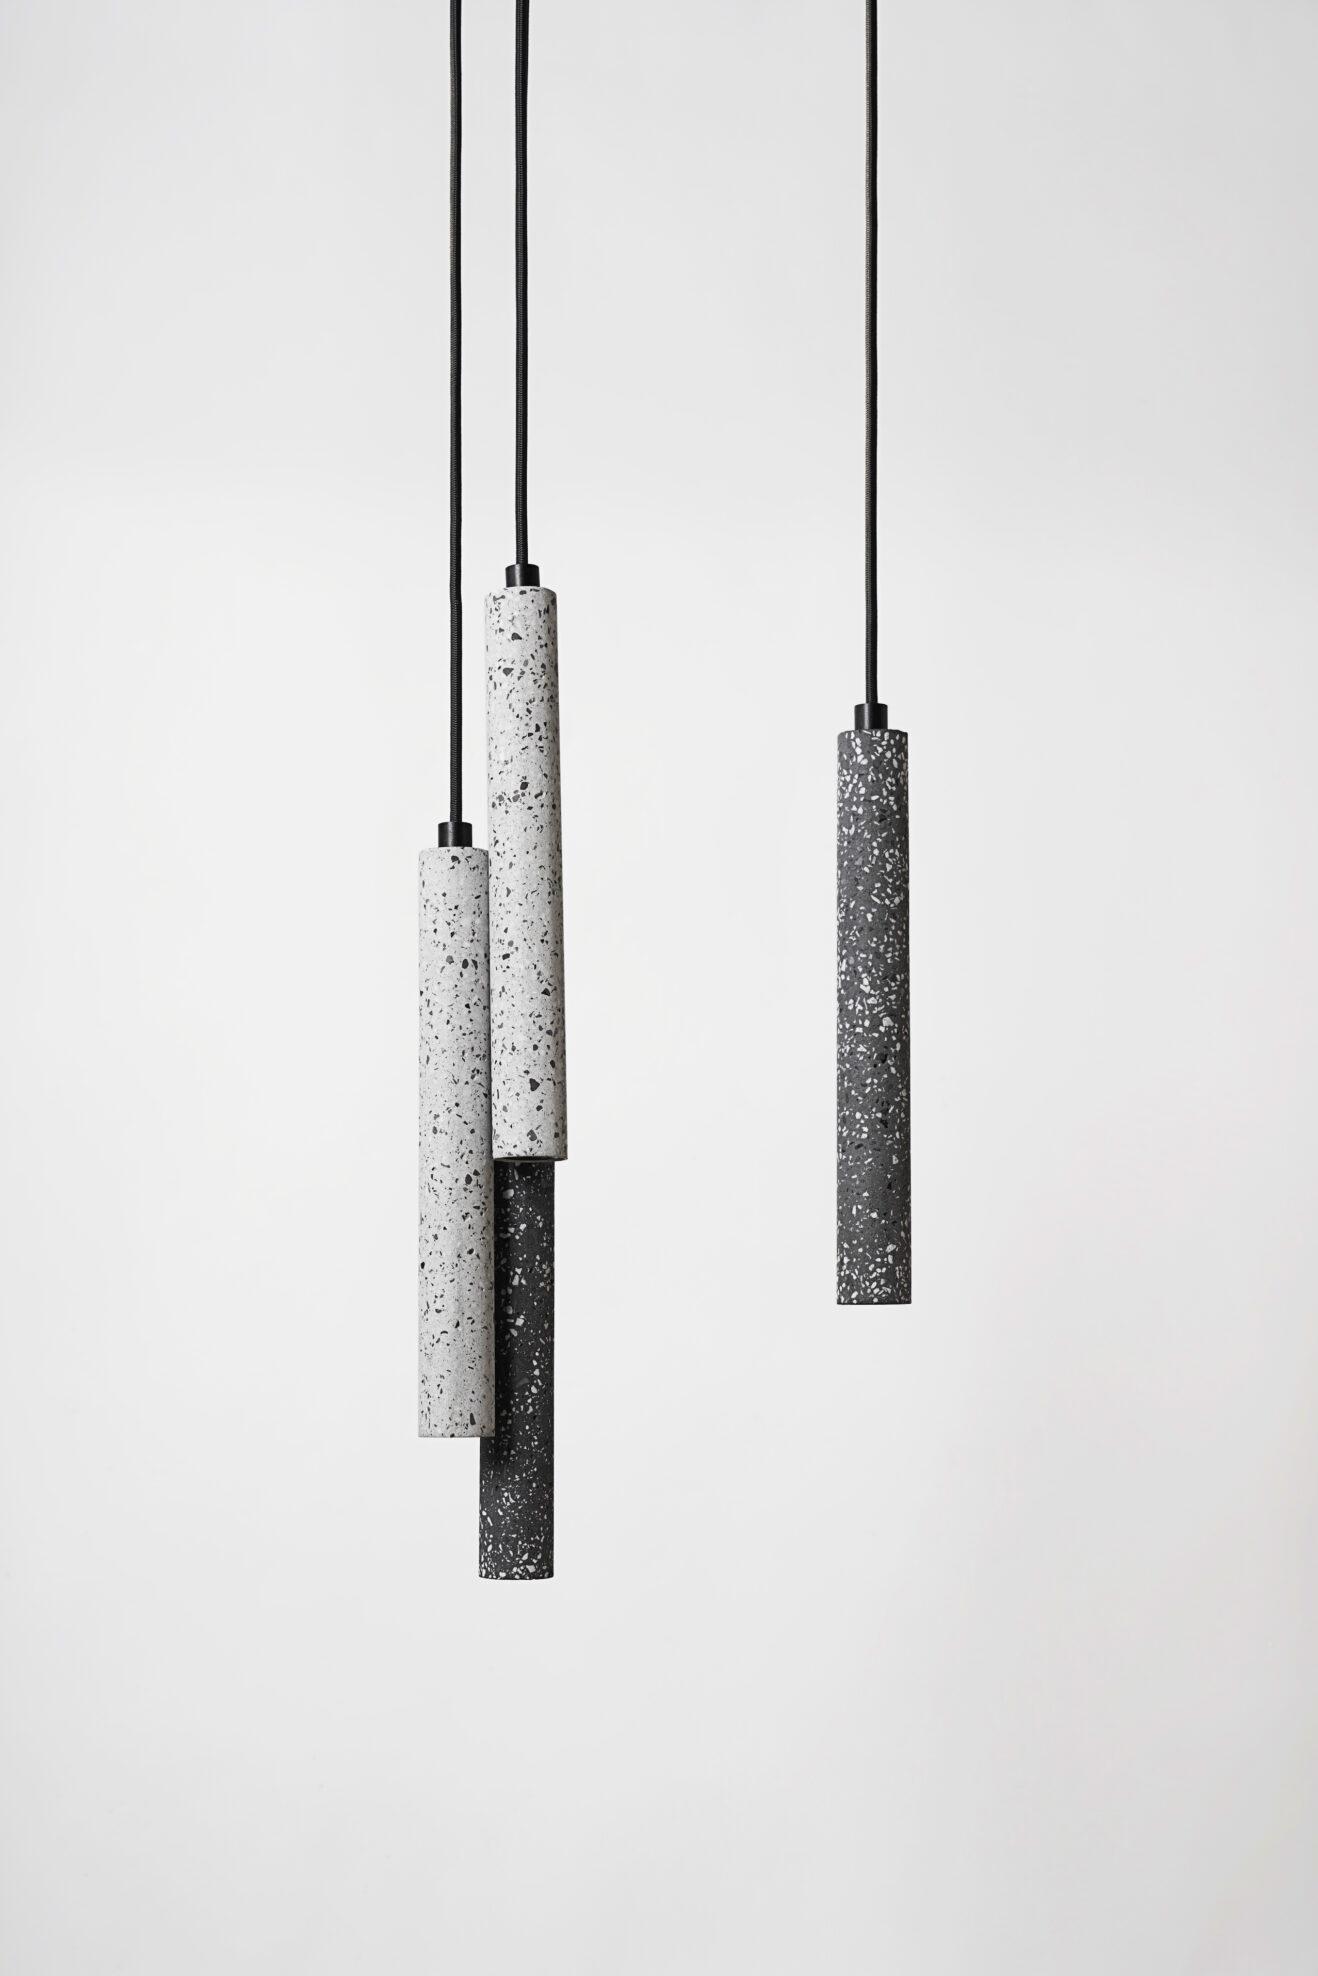 BentuDesign-SavannahBay-Gallery-Bang-Terrazzo-4